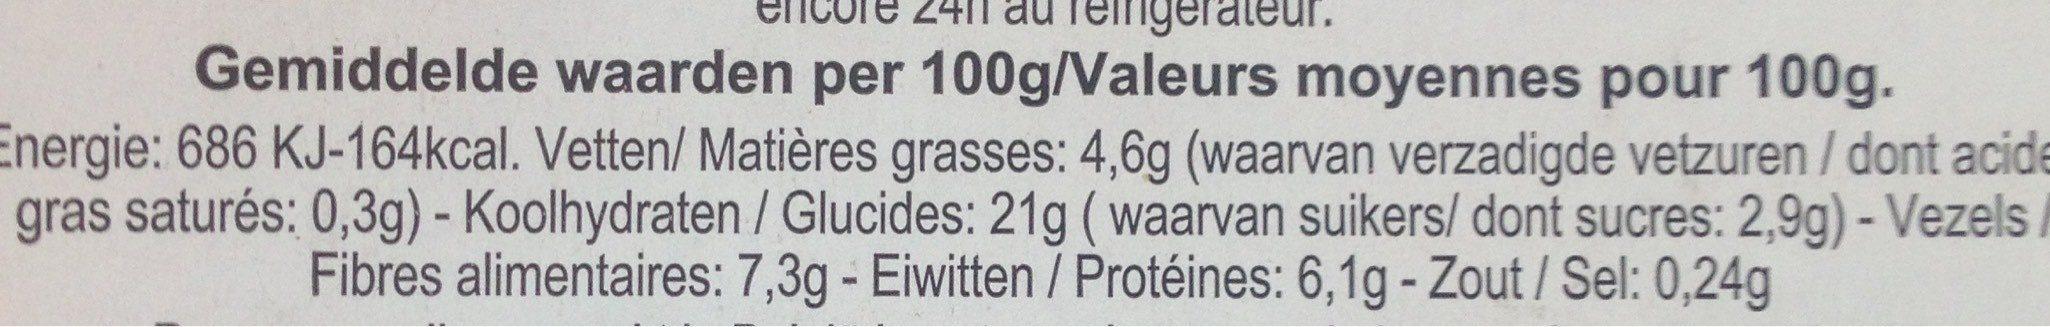 Salade bar Tex-Mex - Informations nutritionnelles - fr